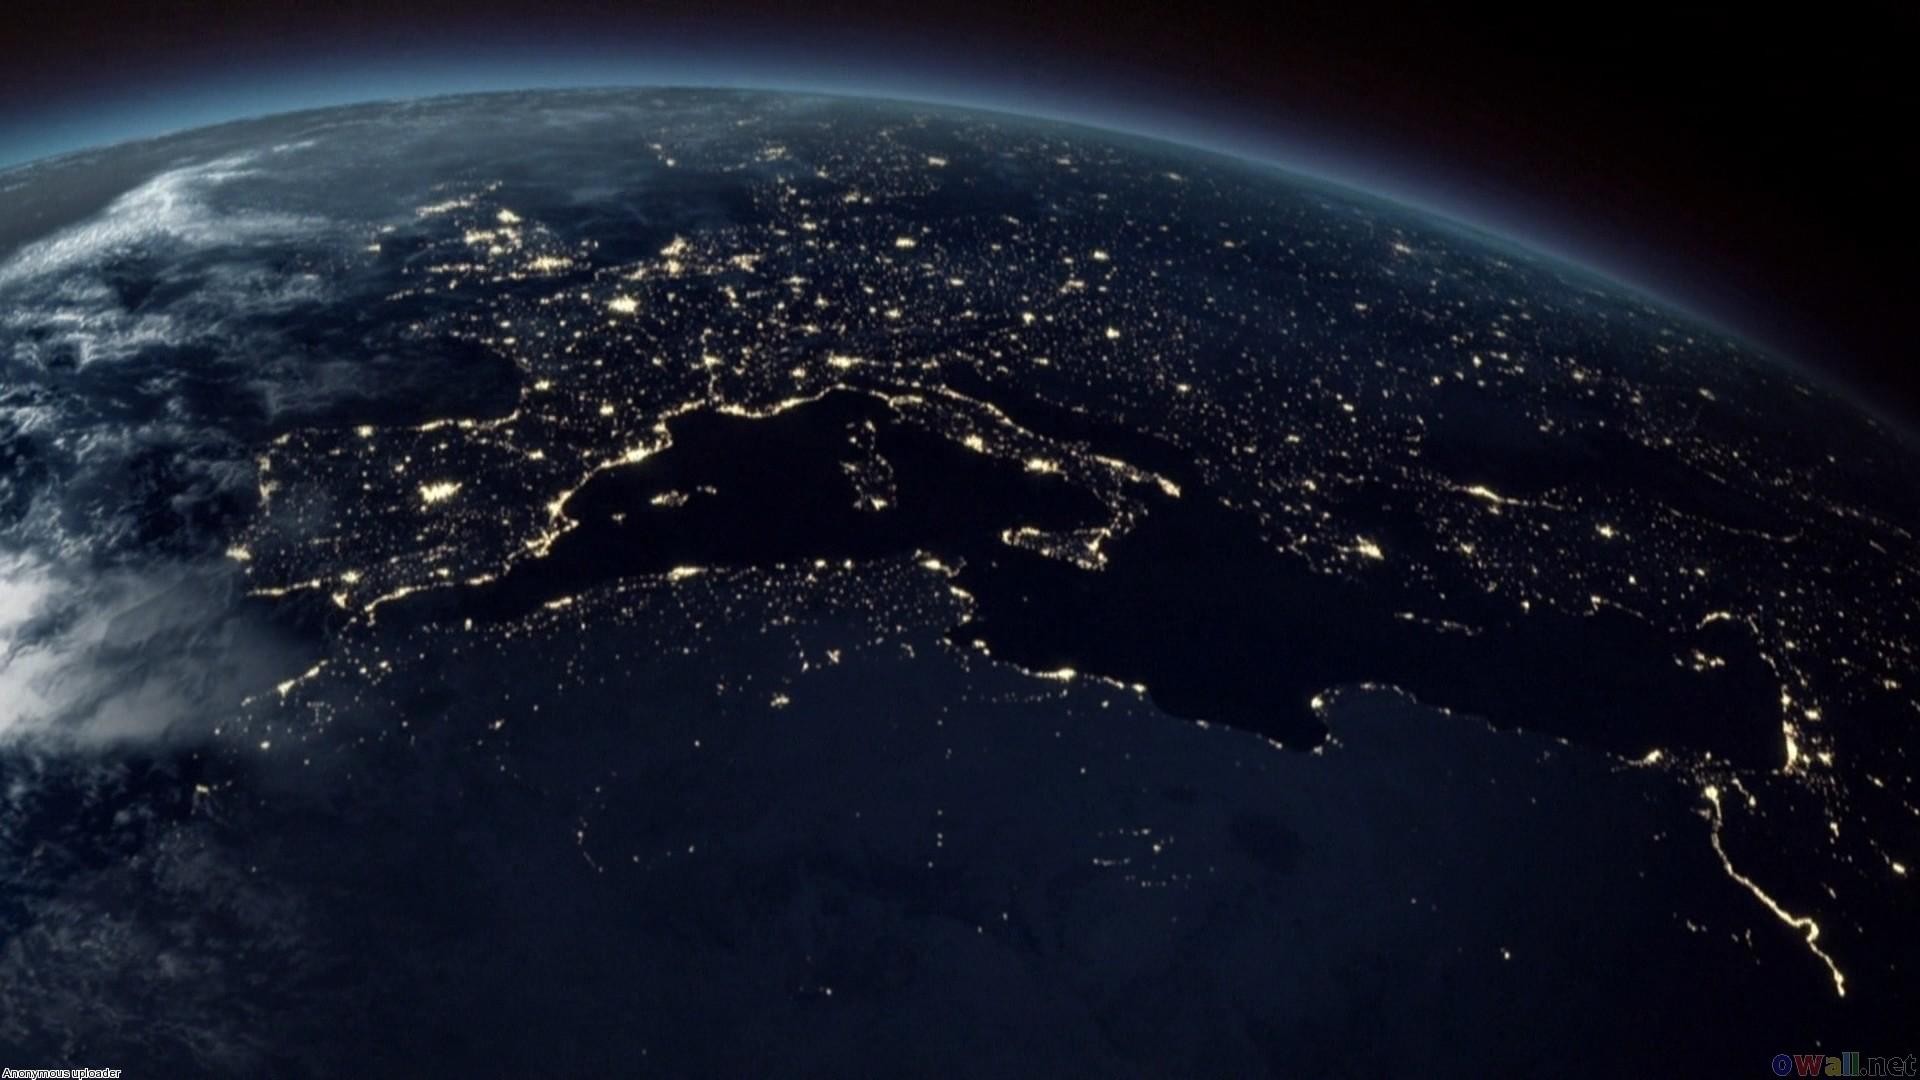 Earth Wallpaper Nasa Earth from space wallpaper hd